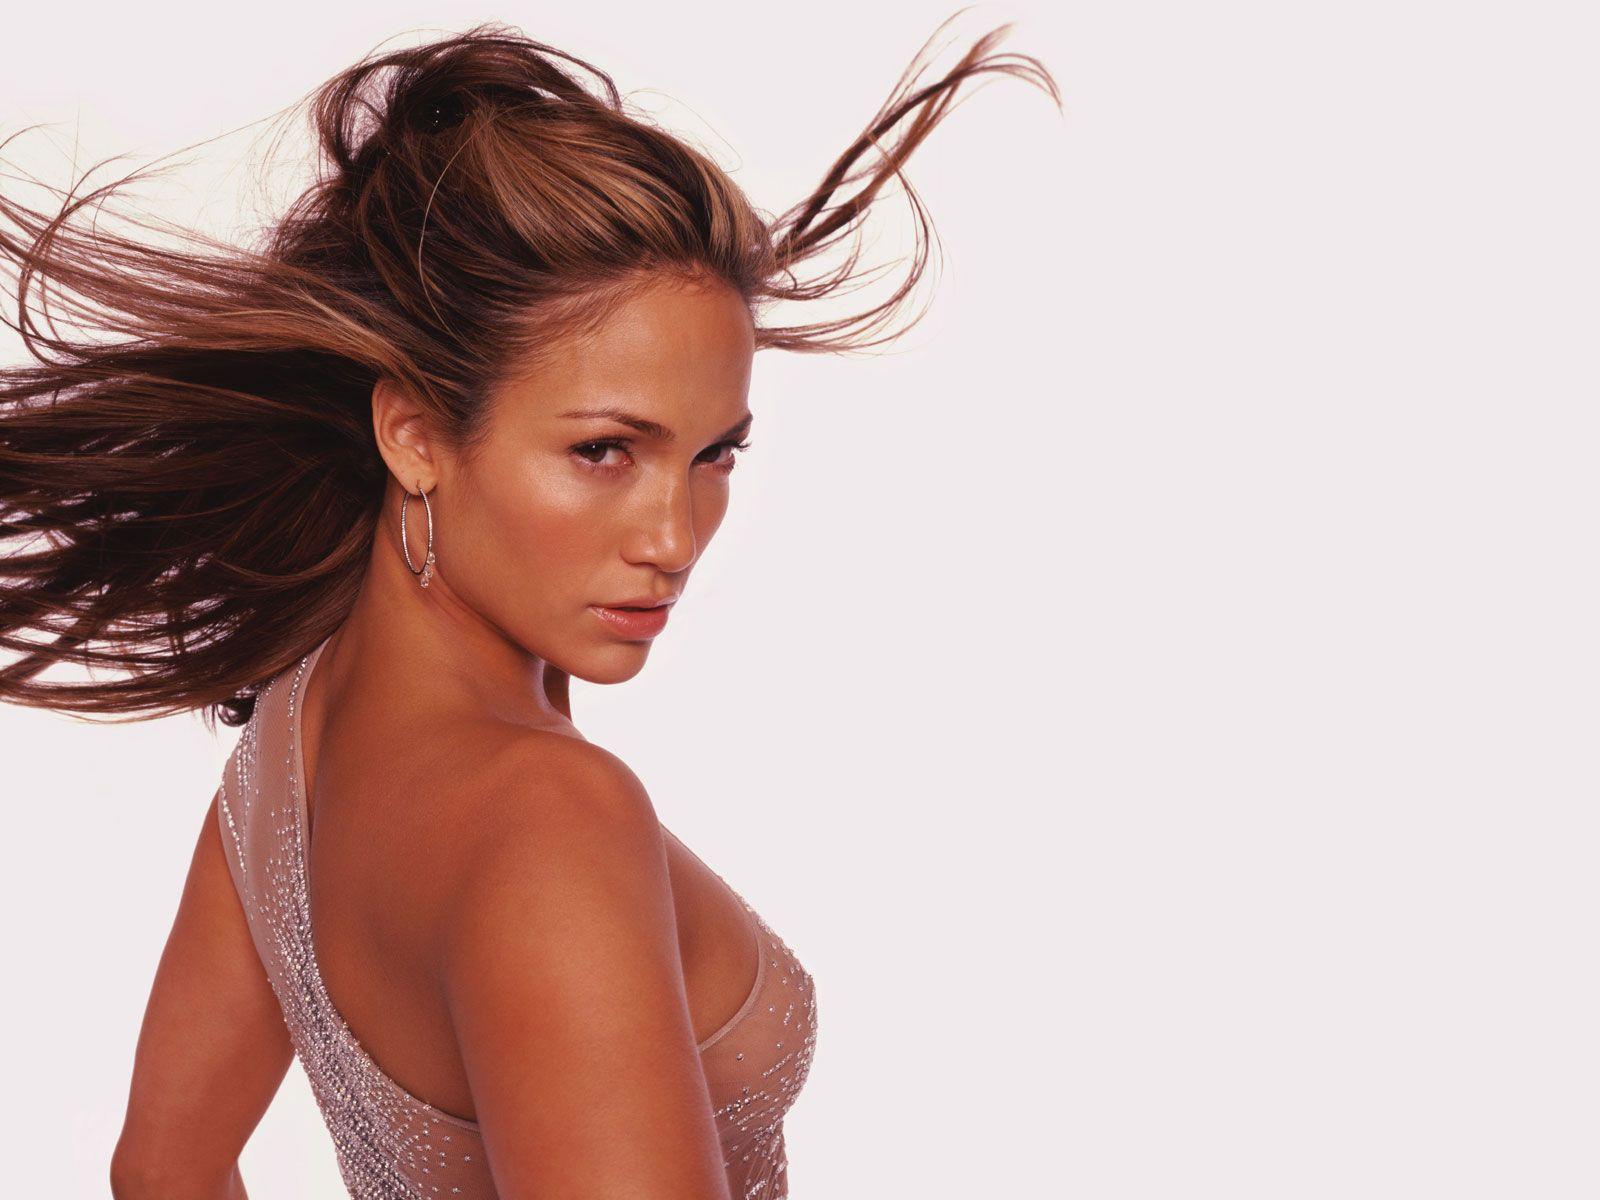 http://4.bp.blogspot.com/-FmCzkxI8SL0/UKOVH_RQROI/AAAAAAAAA8o/lXlW9sFXUpI/s1600/Jennifer+Lopez+HD+2012+Wallpapers+1600+X+1200+(4).jpg